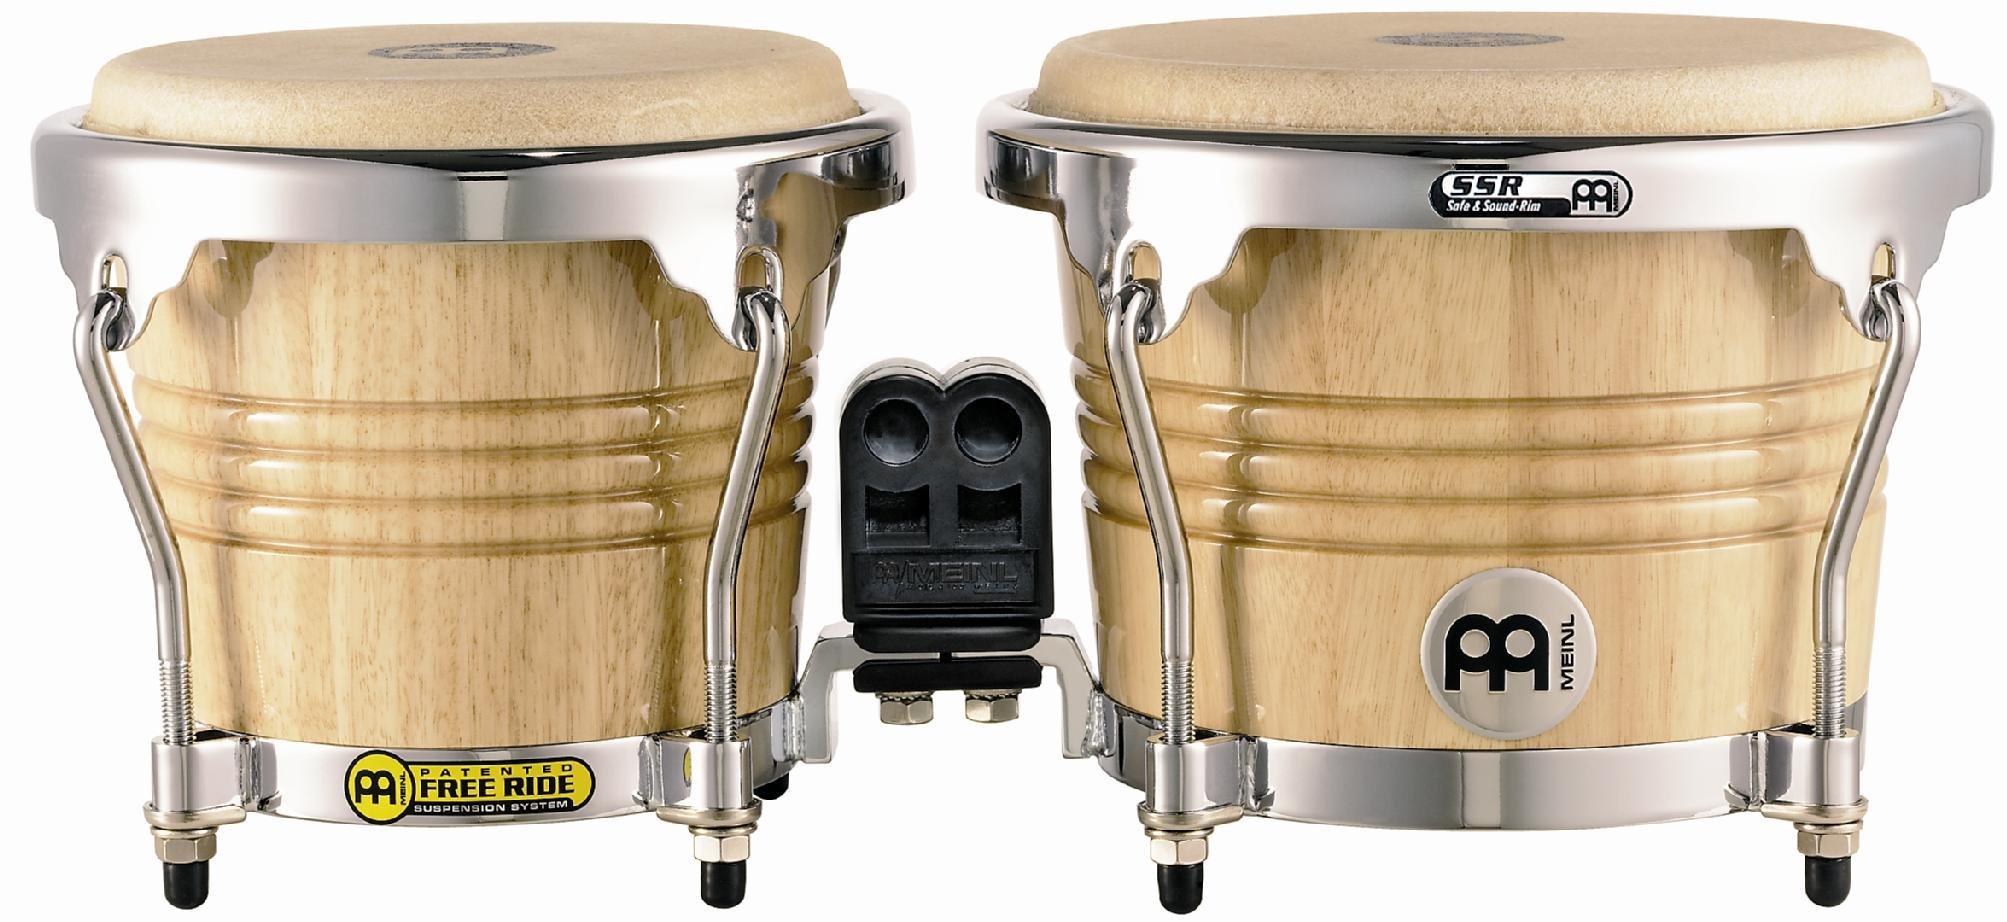 Meinl 6.75-inch + 8-inch Freeride wood Series Bongo